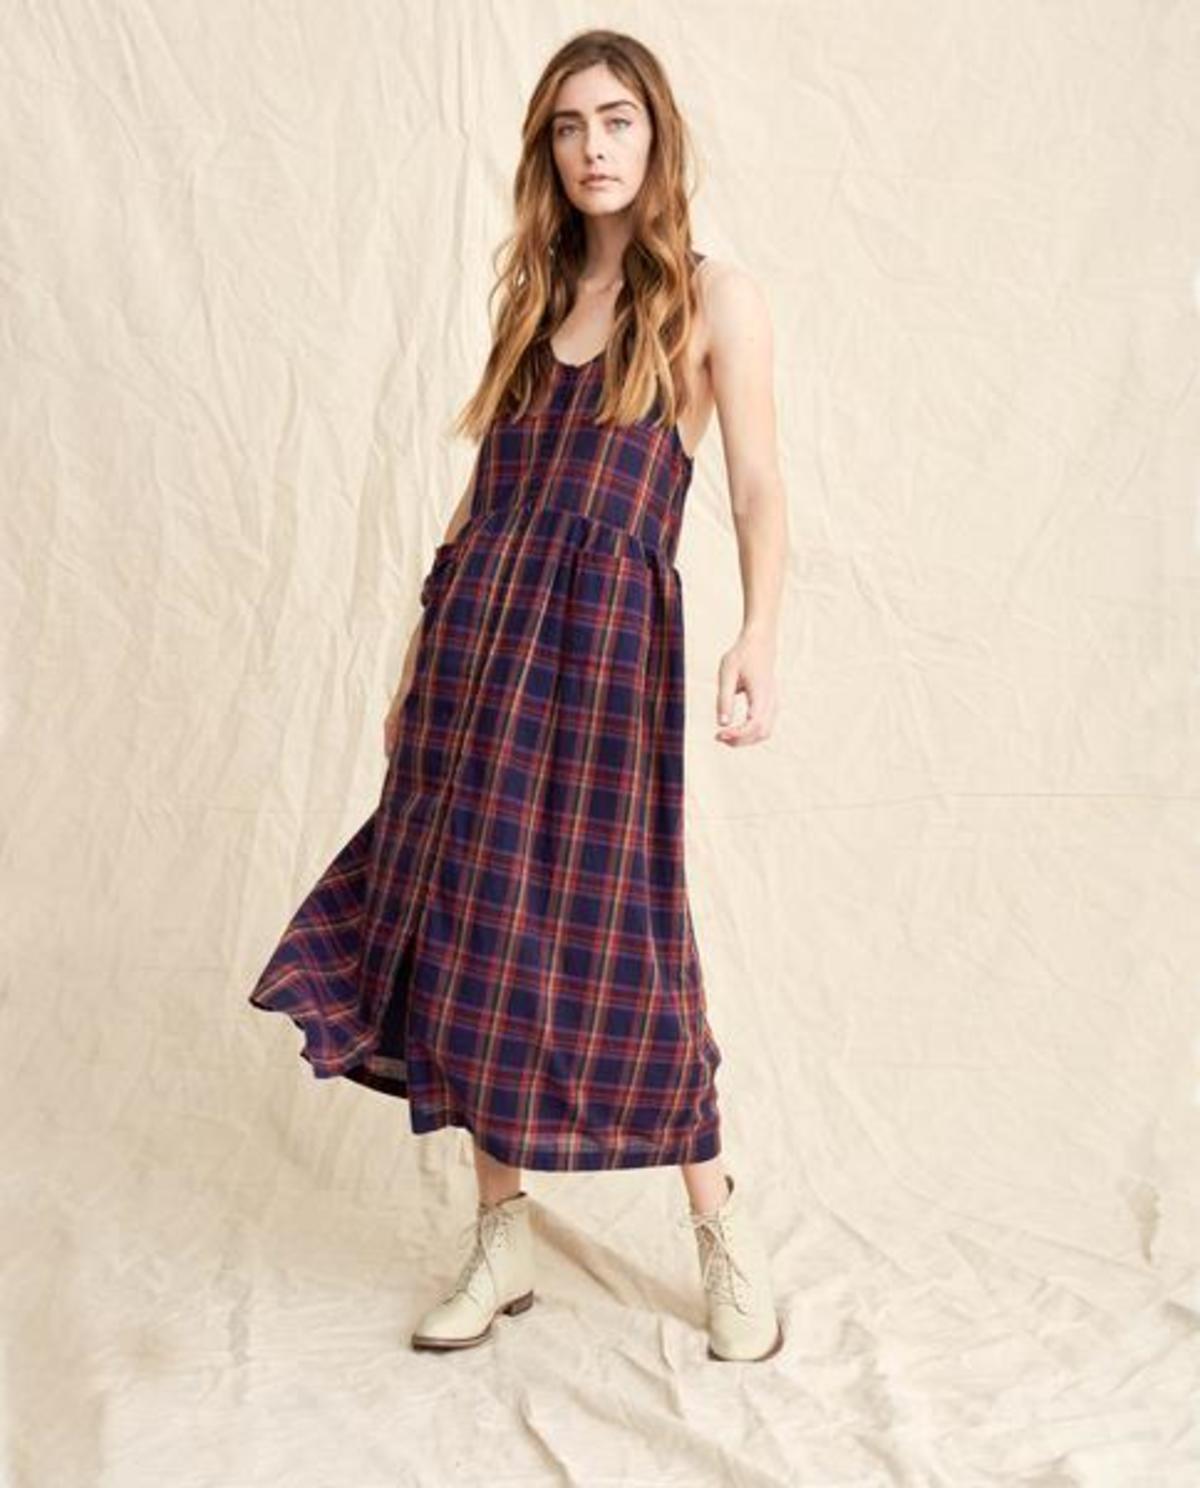 3d9ec09dfa789 The Great. The Harvest Dress - CANDY PLAID